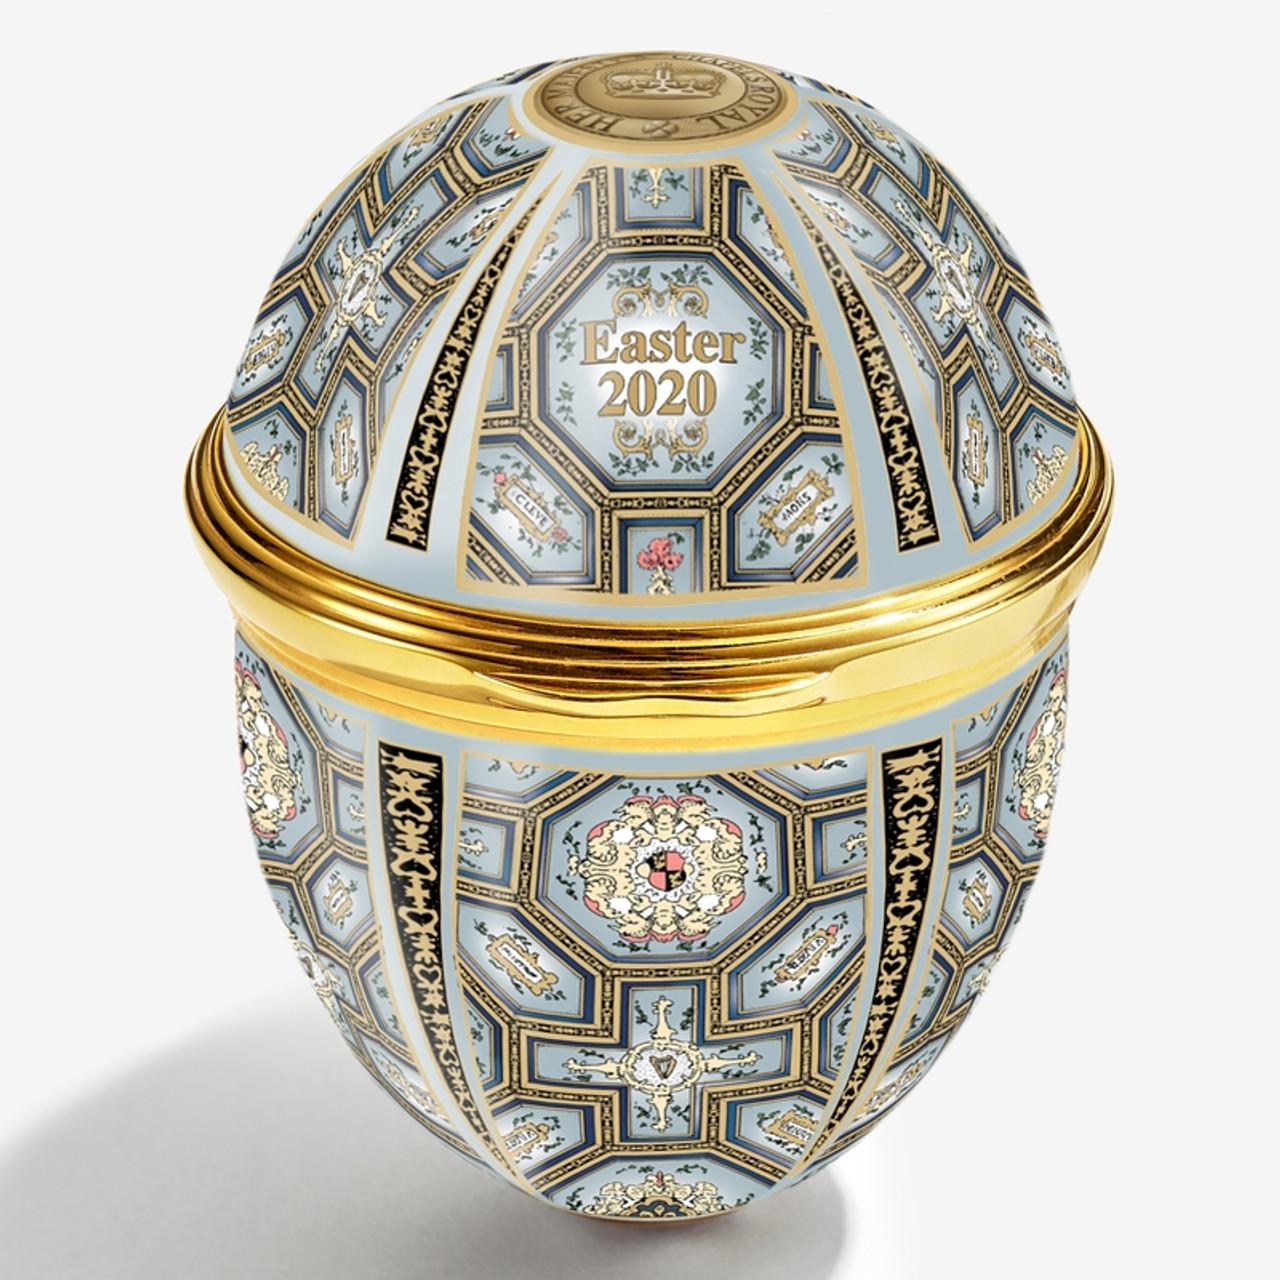 Halcyon Days 2019 Easter Egg Box ENEG200108G